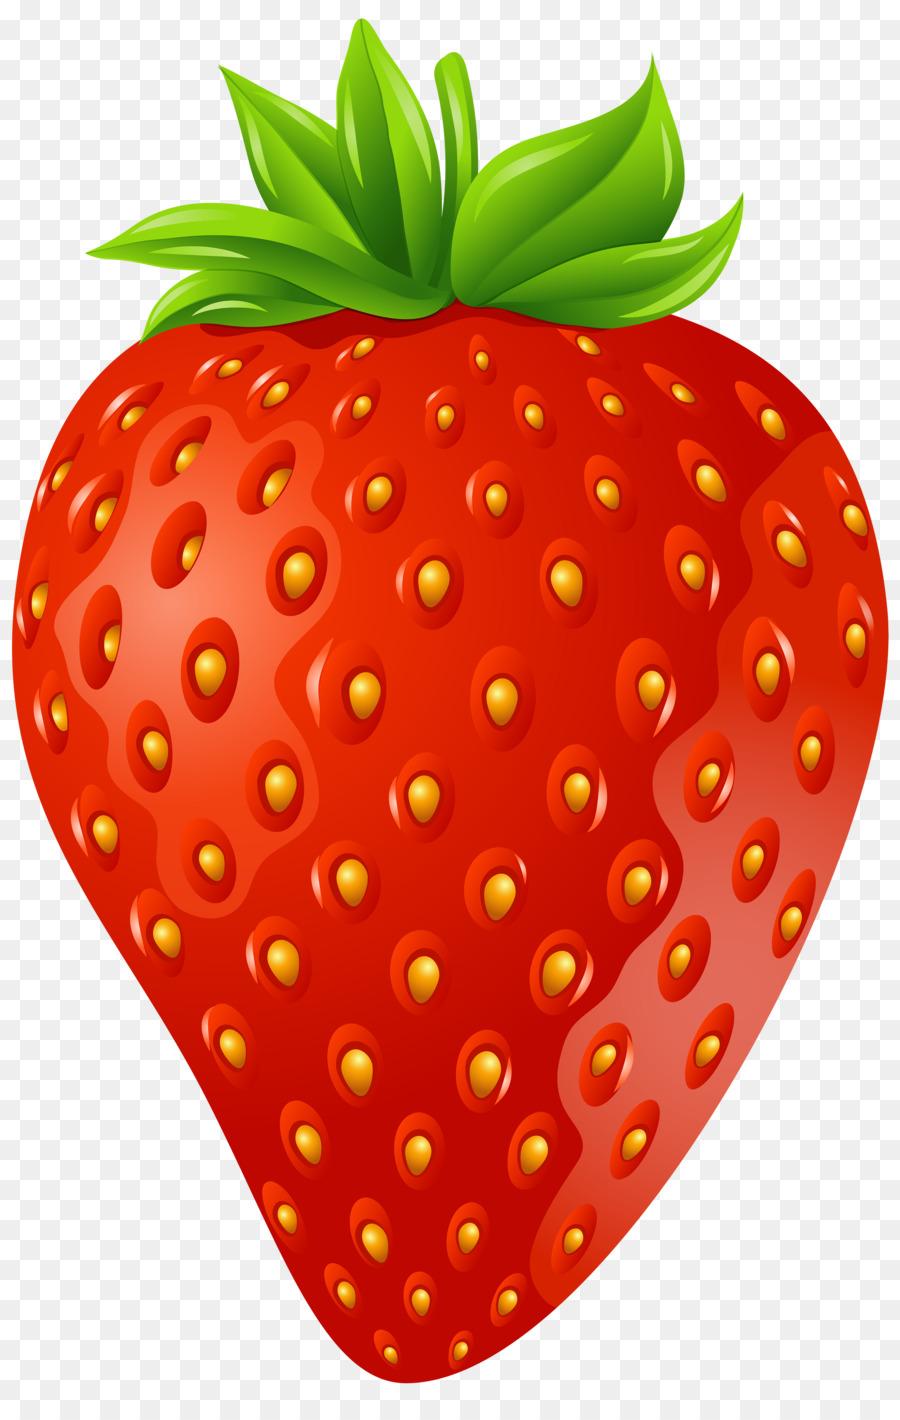 Strawberry Shortcake Cartoon